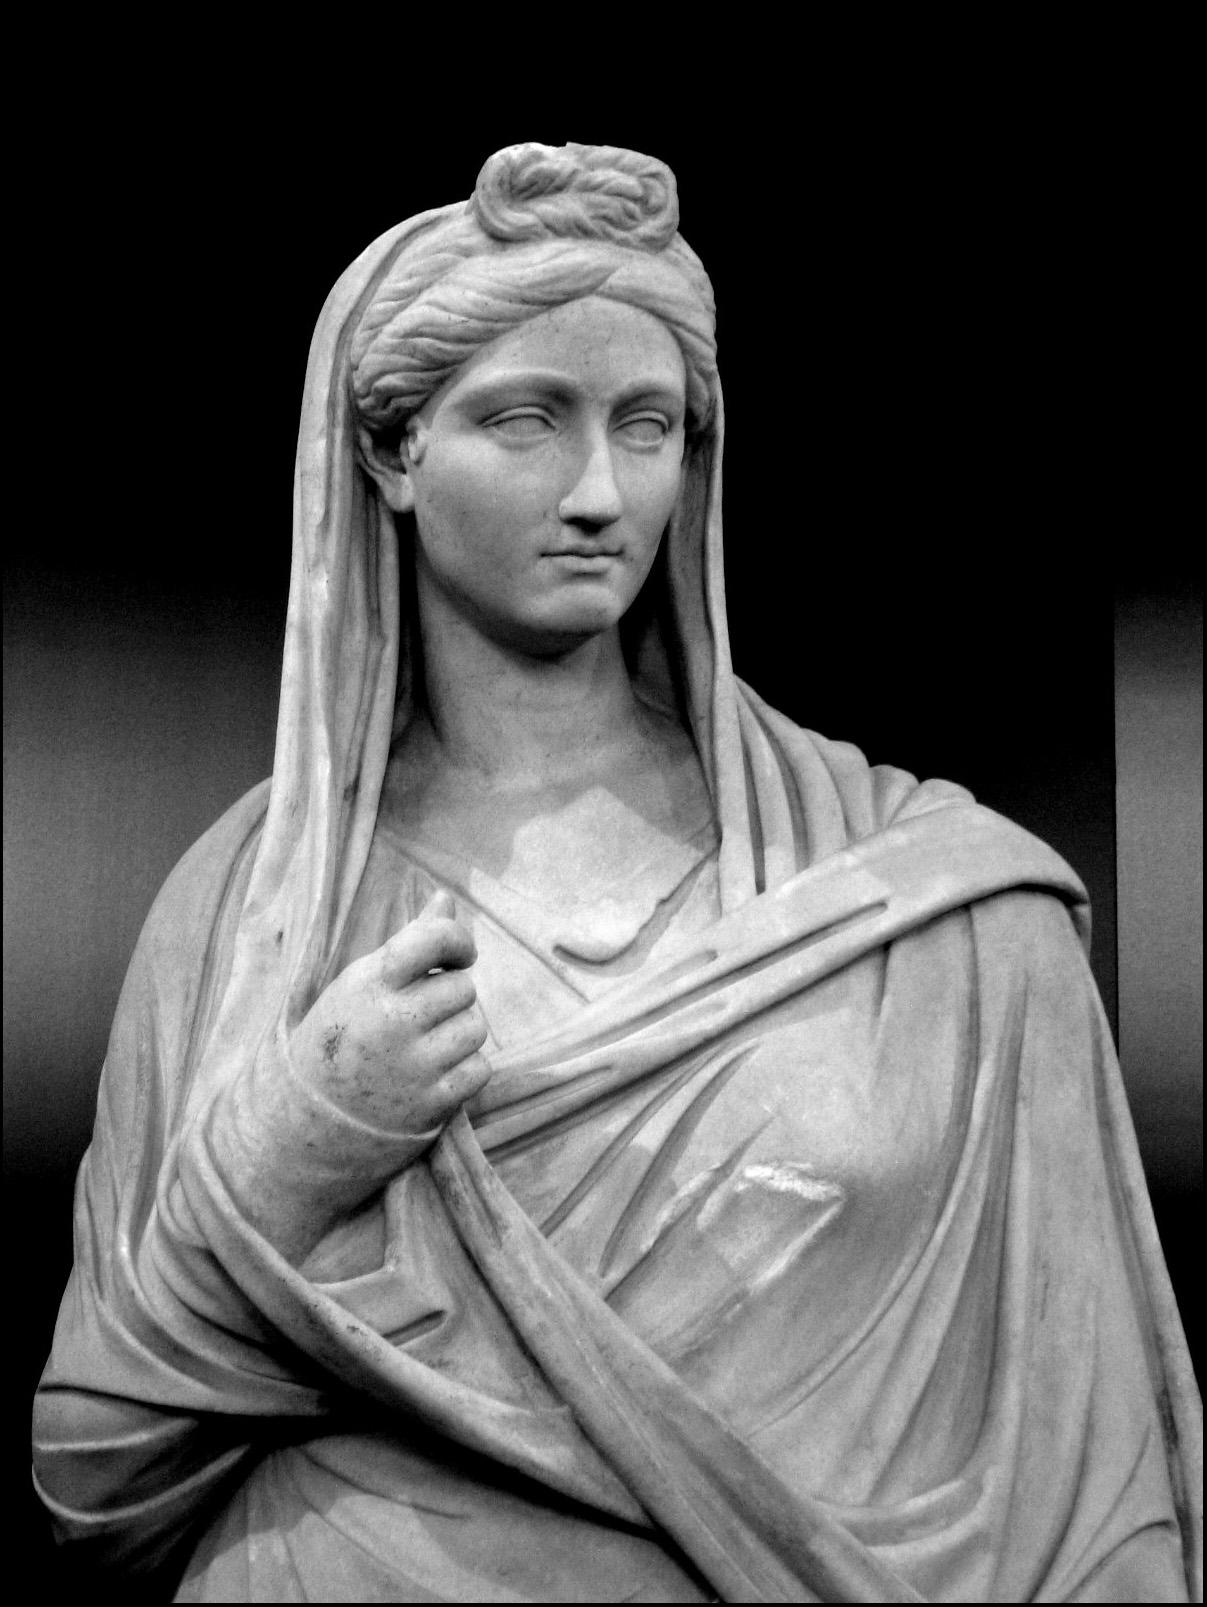 Mulher romana